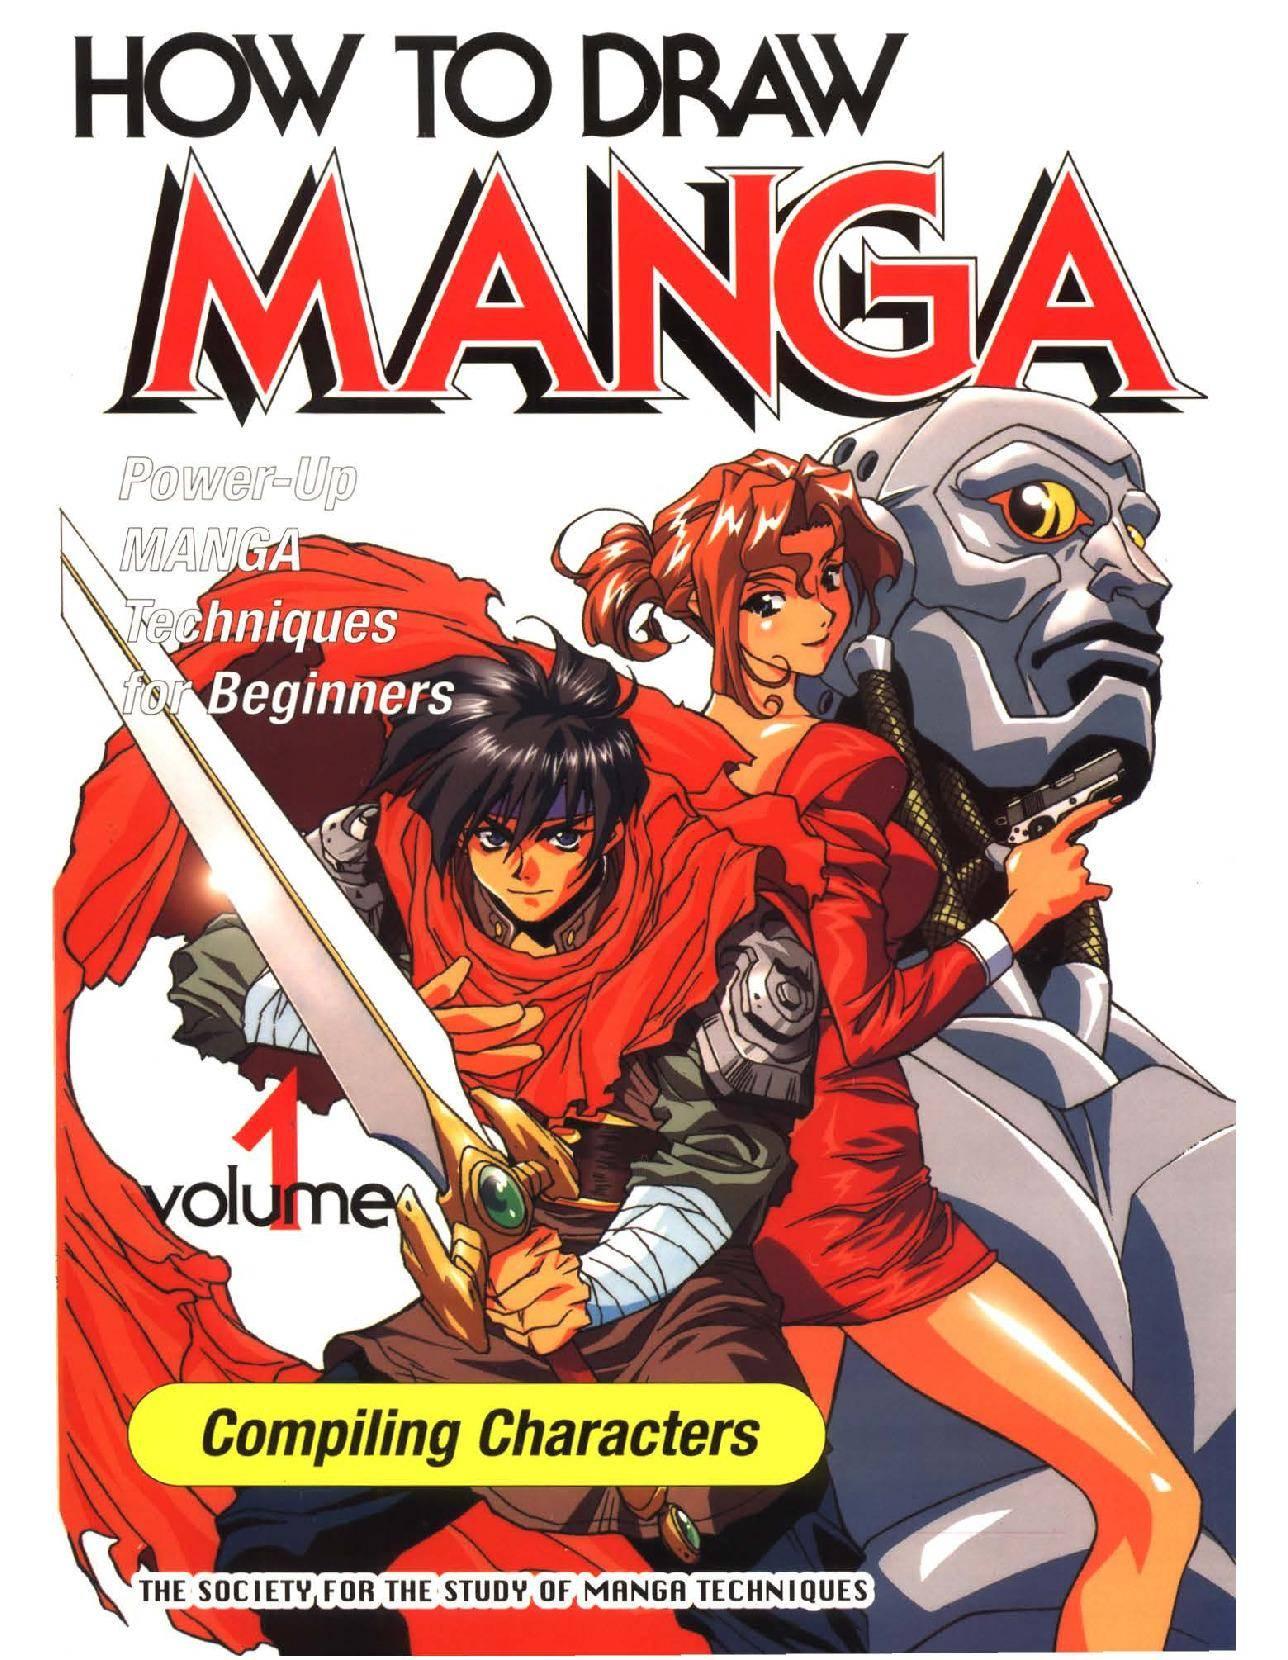 How to Draw Manga Vol 11 Maids Miko r